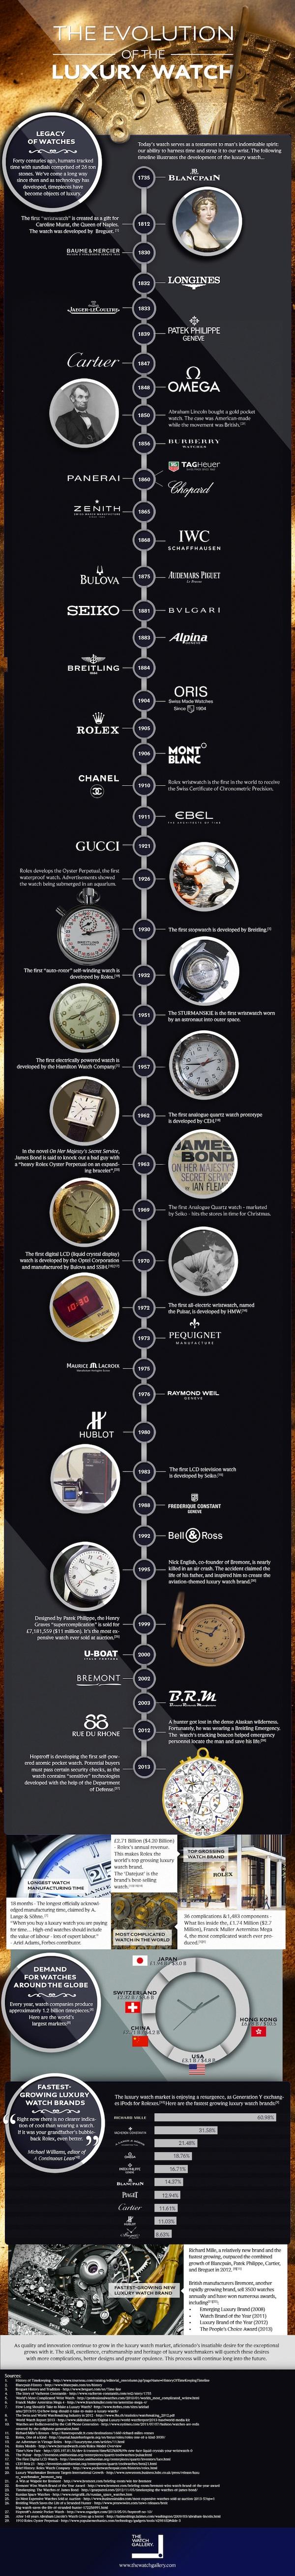 infographic twg